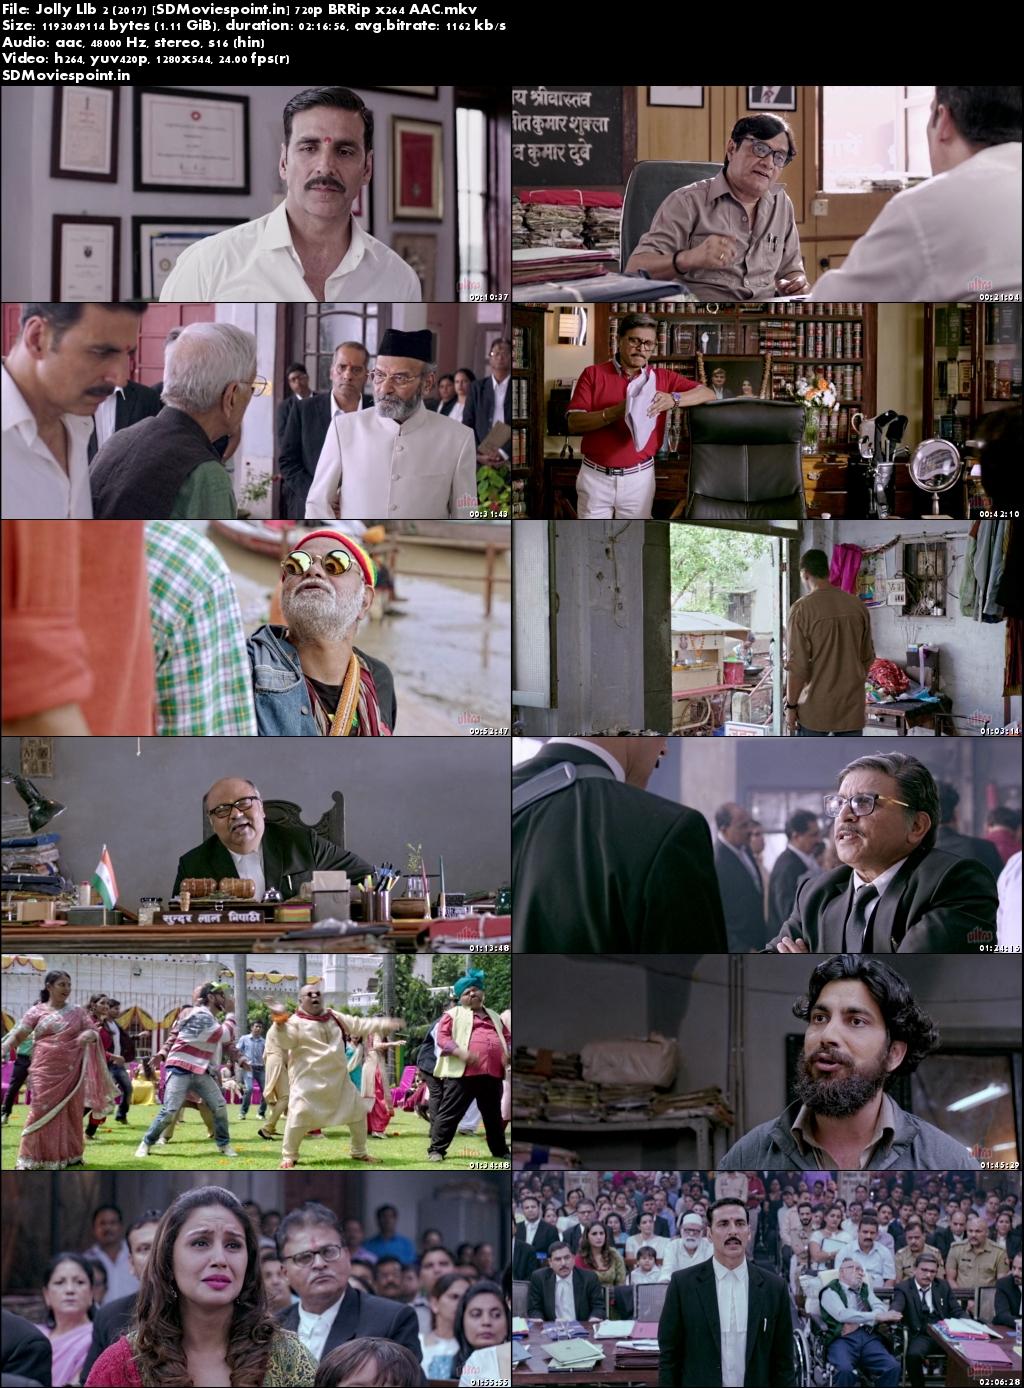 Screen Shots Jolly LLB 2 (2017) Full HD Movie Download 720p